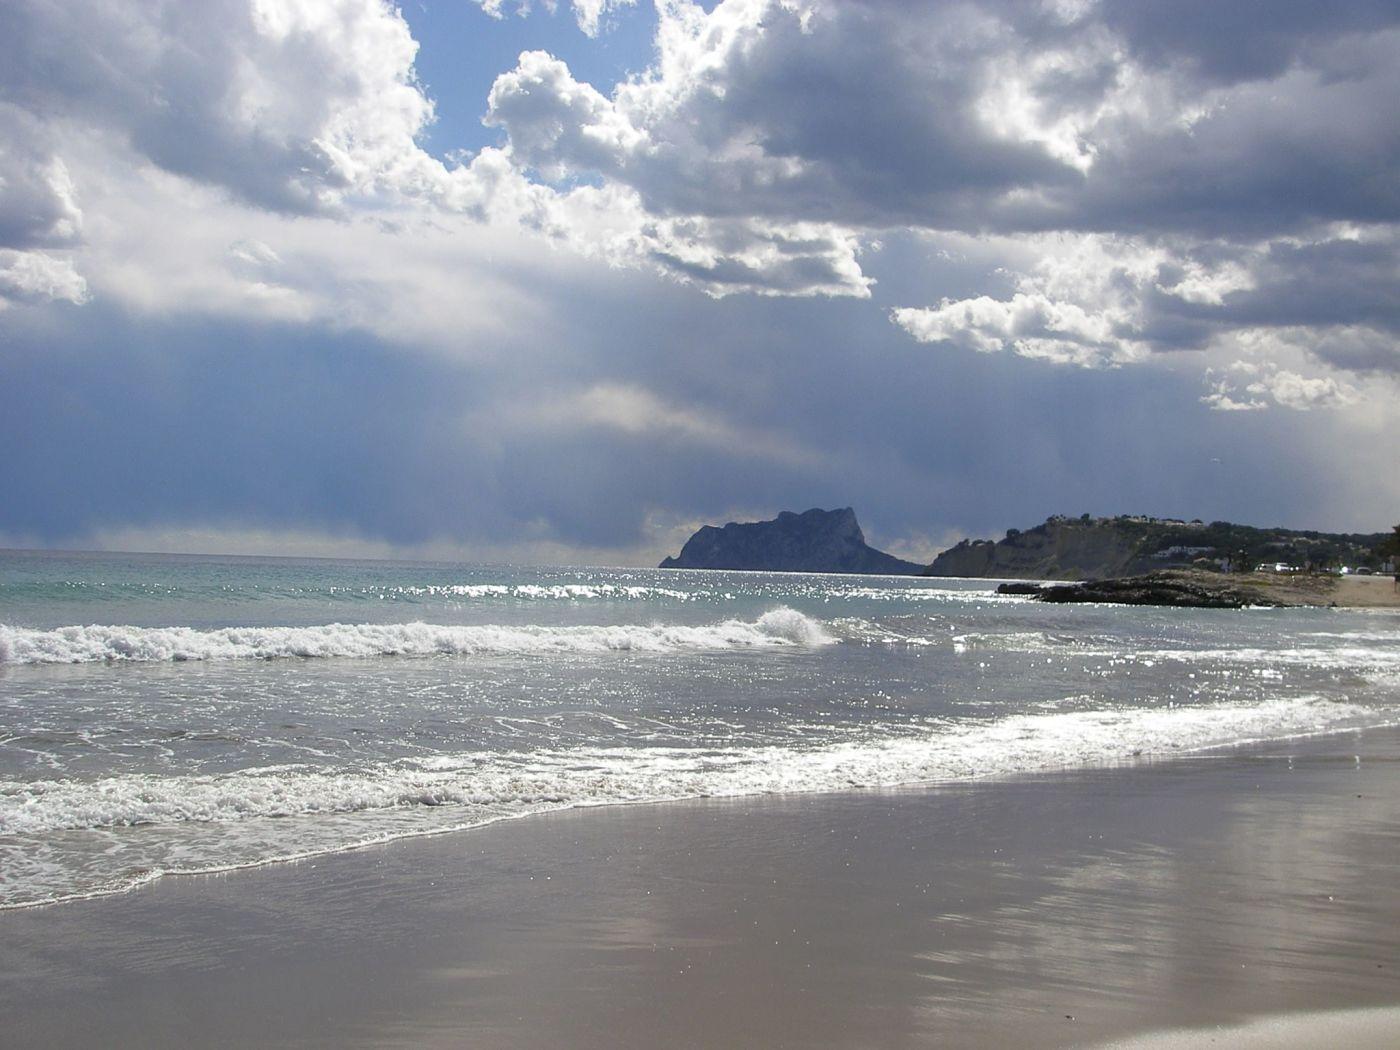 Calidad de aguas marinas